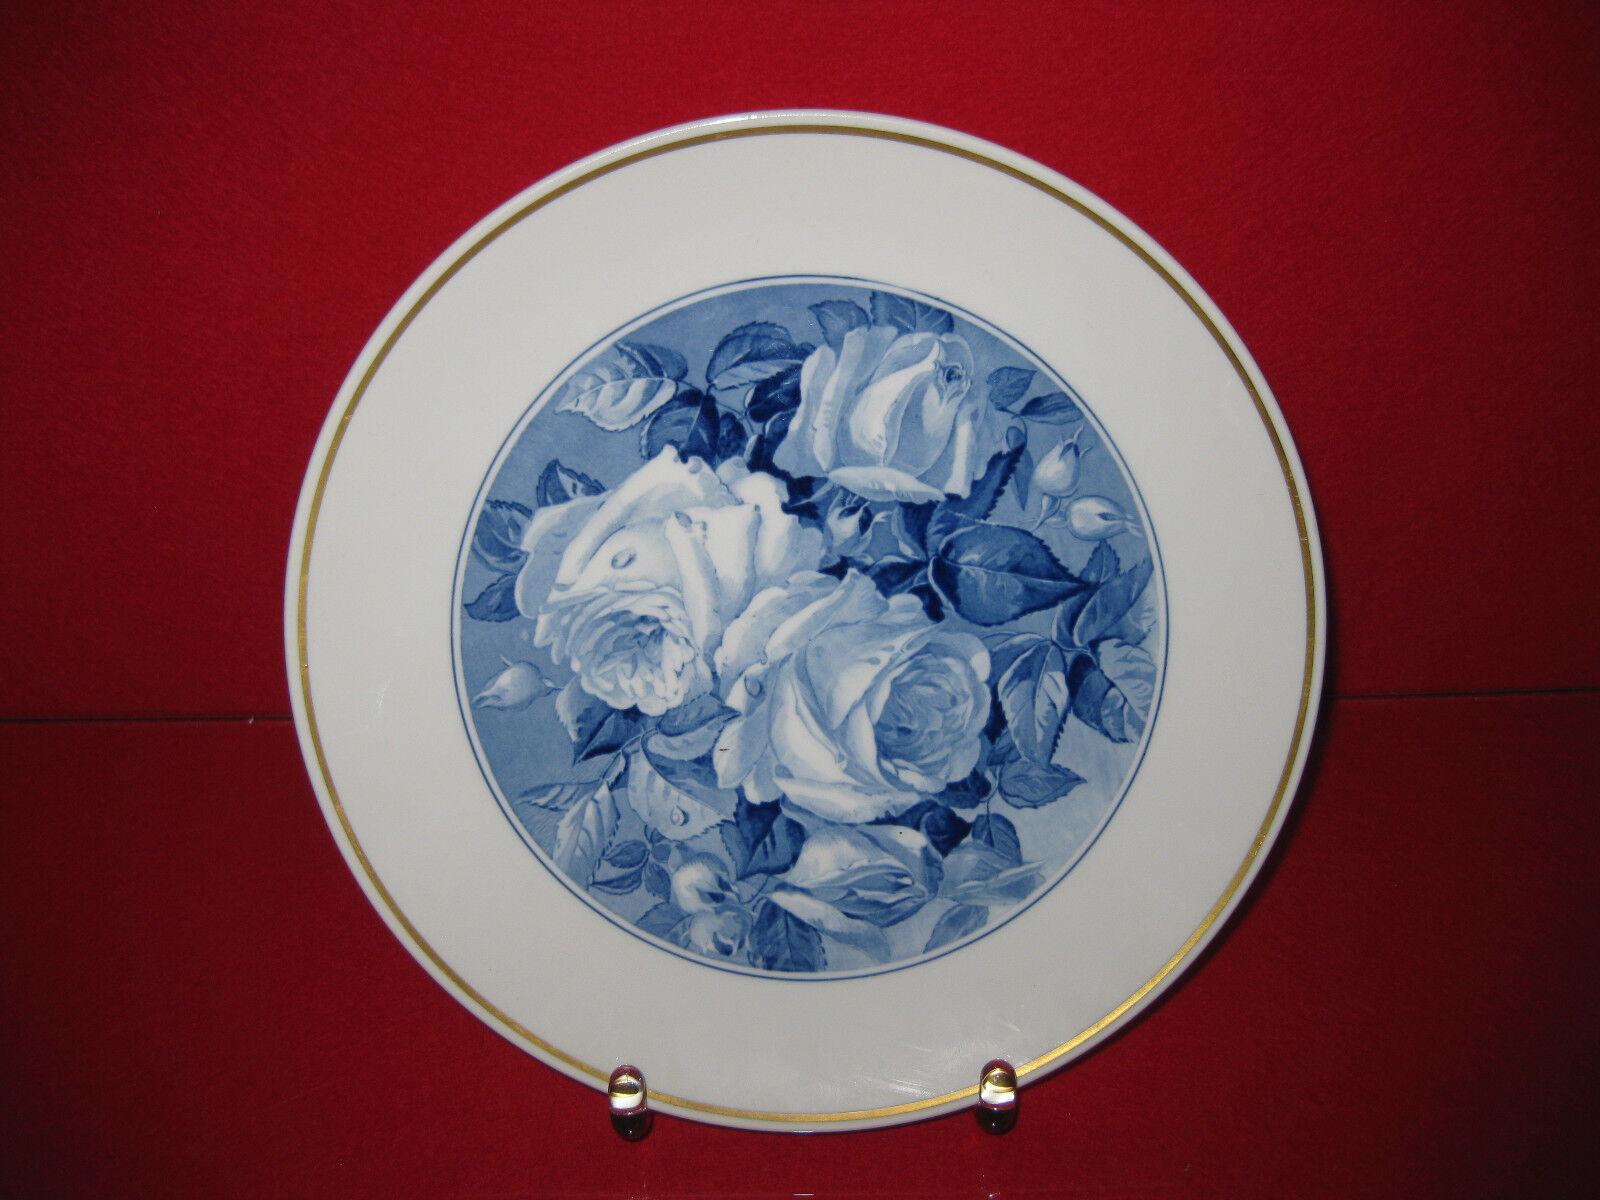 Meissen  Wandteller 1 Wahl Teller bluee blueme bluemenmalerei pink Top Zustand